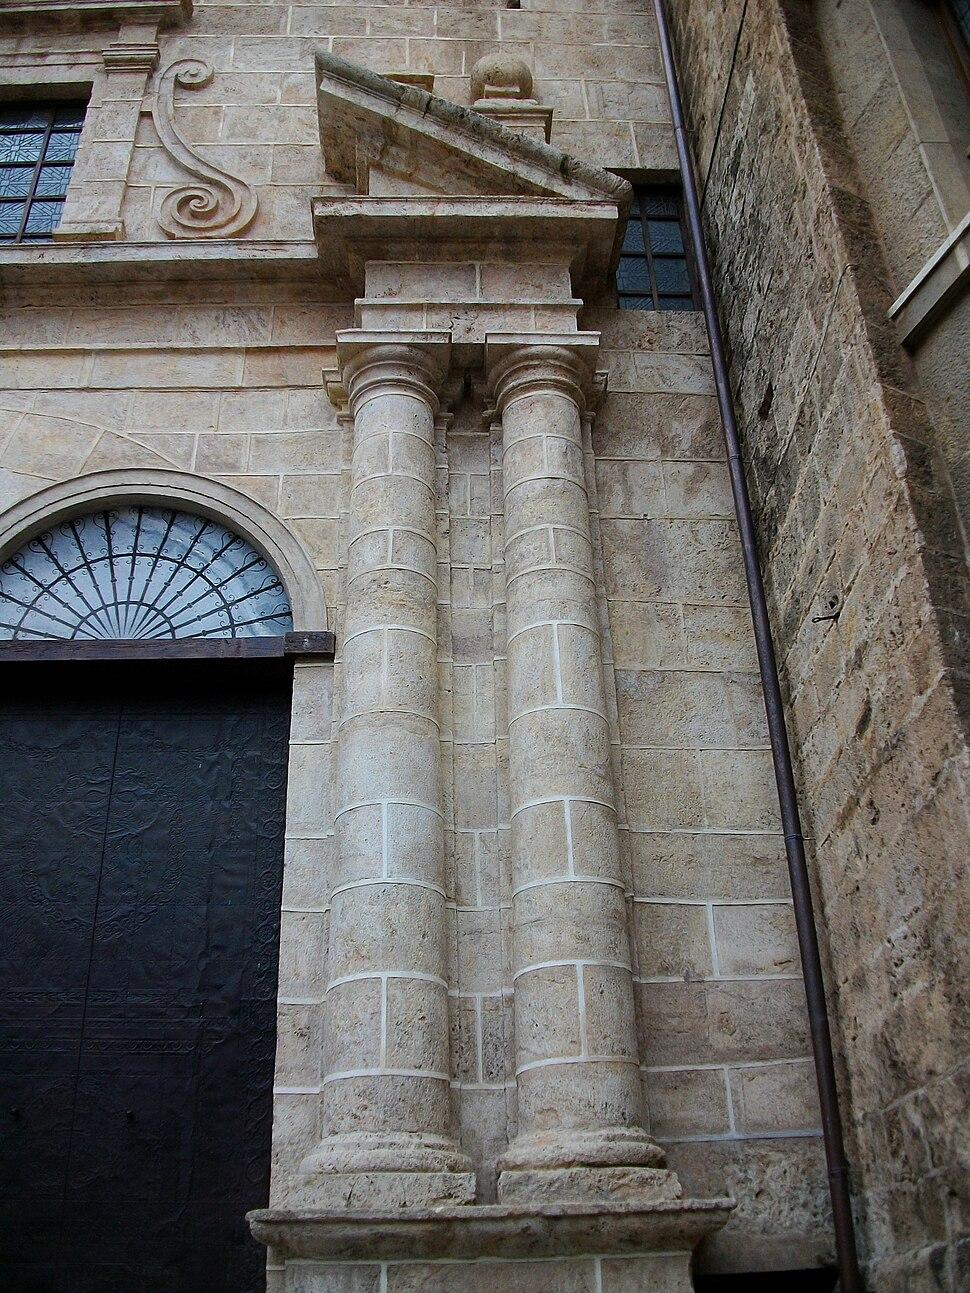 Columnes de la portada de la catedral de Sogorb